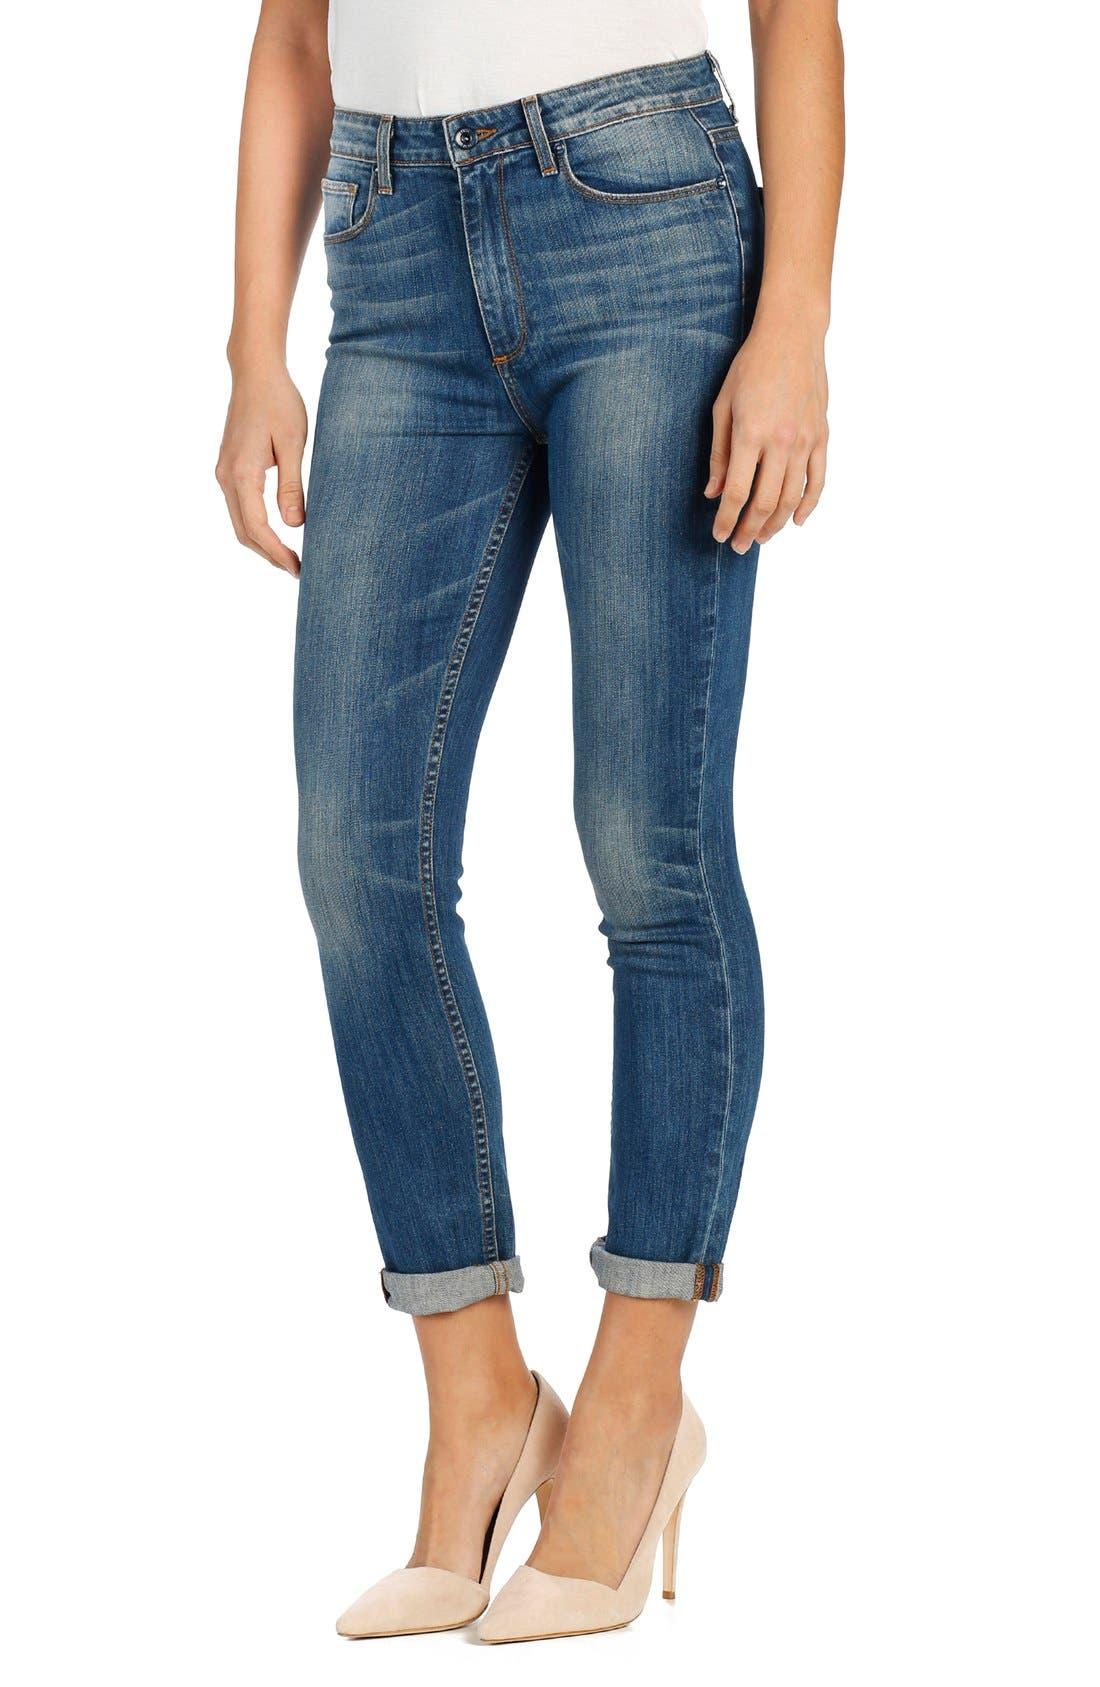 Alternate Image 1 Selected - PAIGE 'Carter' High Rise Crop Slim Jeans (Tallulah)